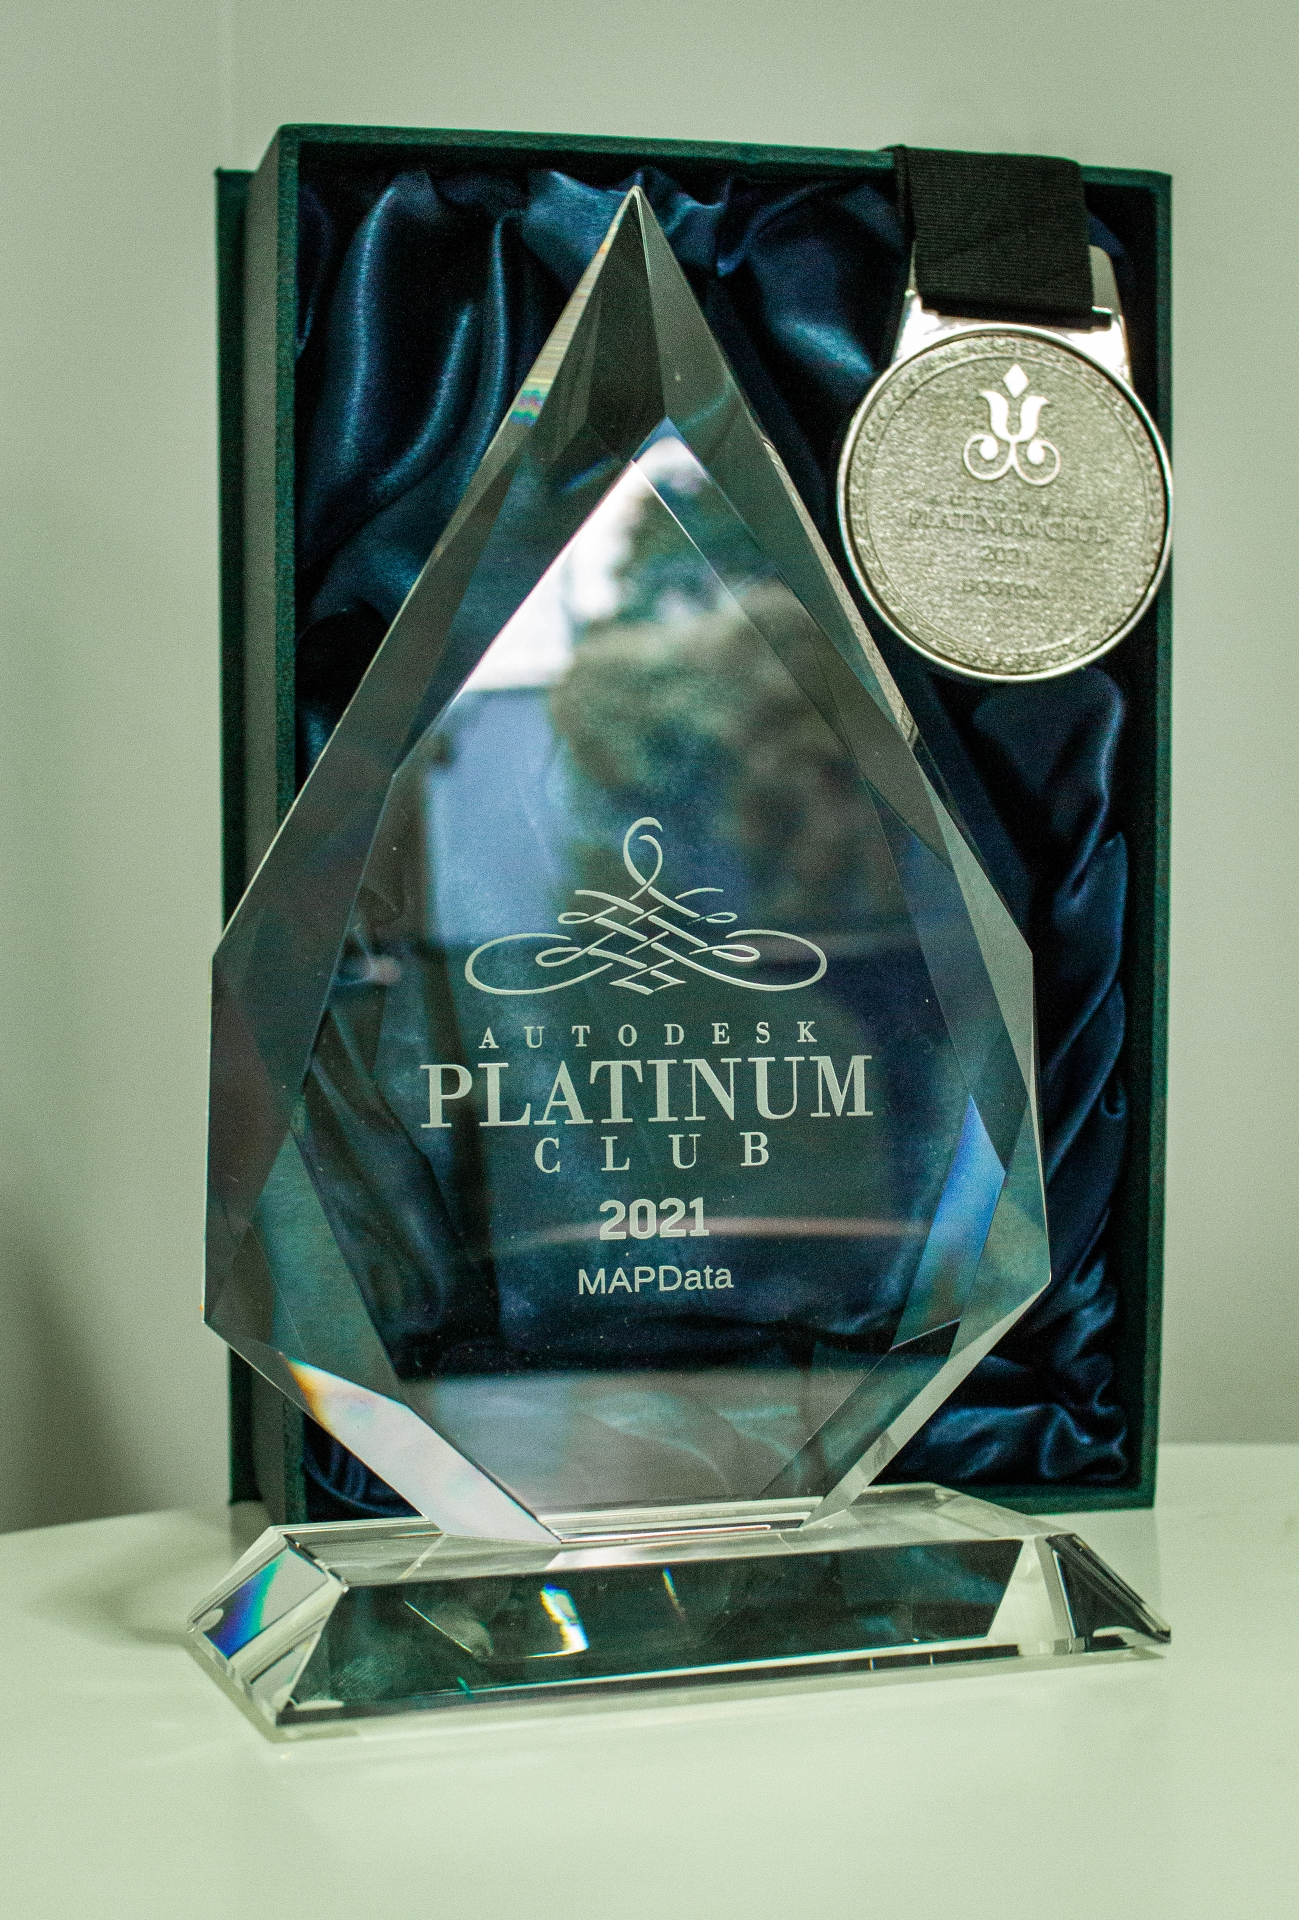 Autodesk-Platinum-Club-Award-2021